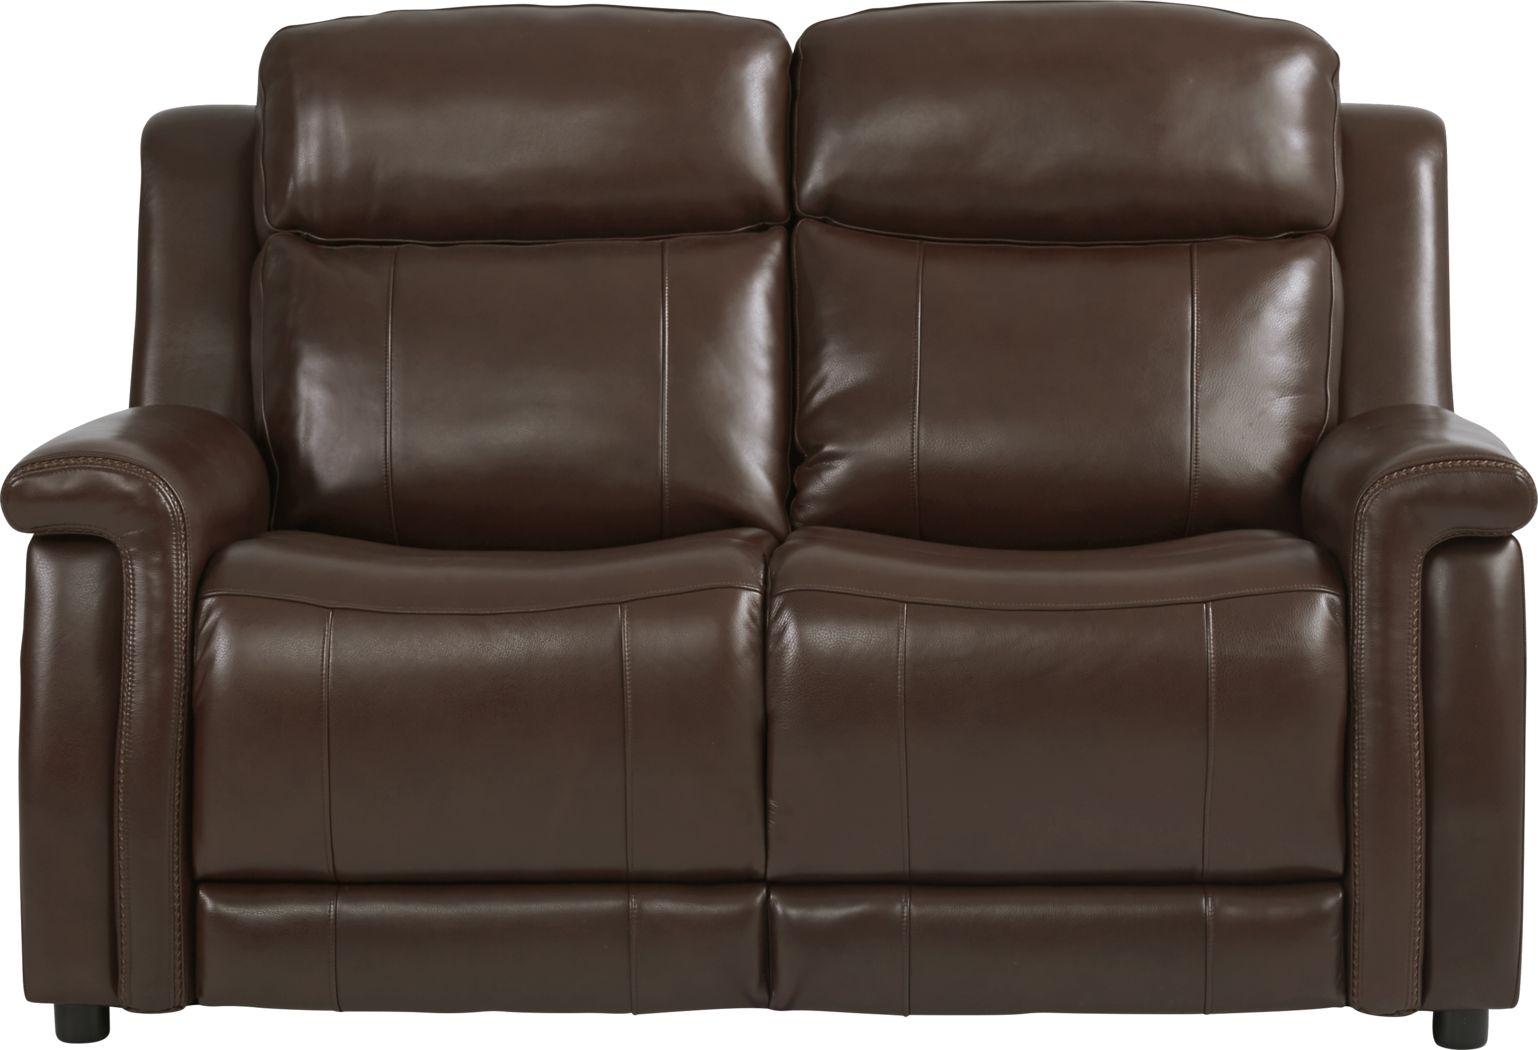 Orsini Brown Leather Loveseat